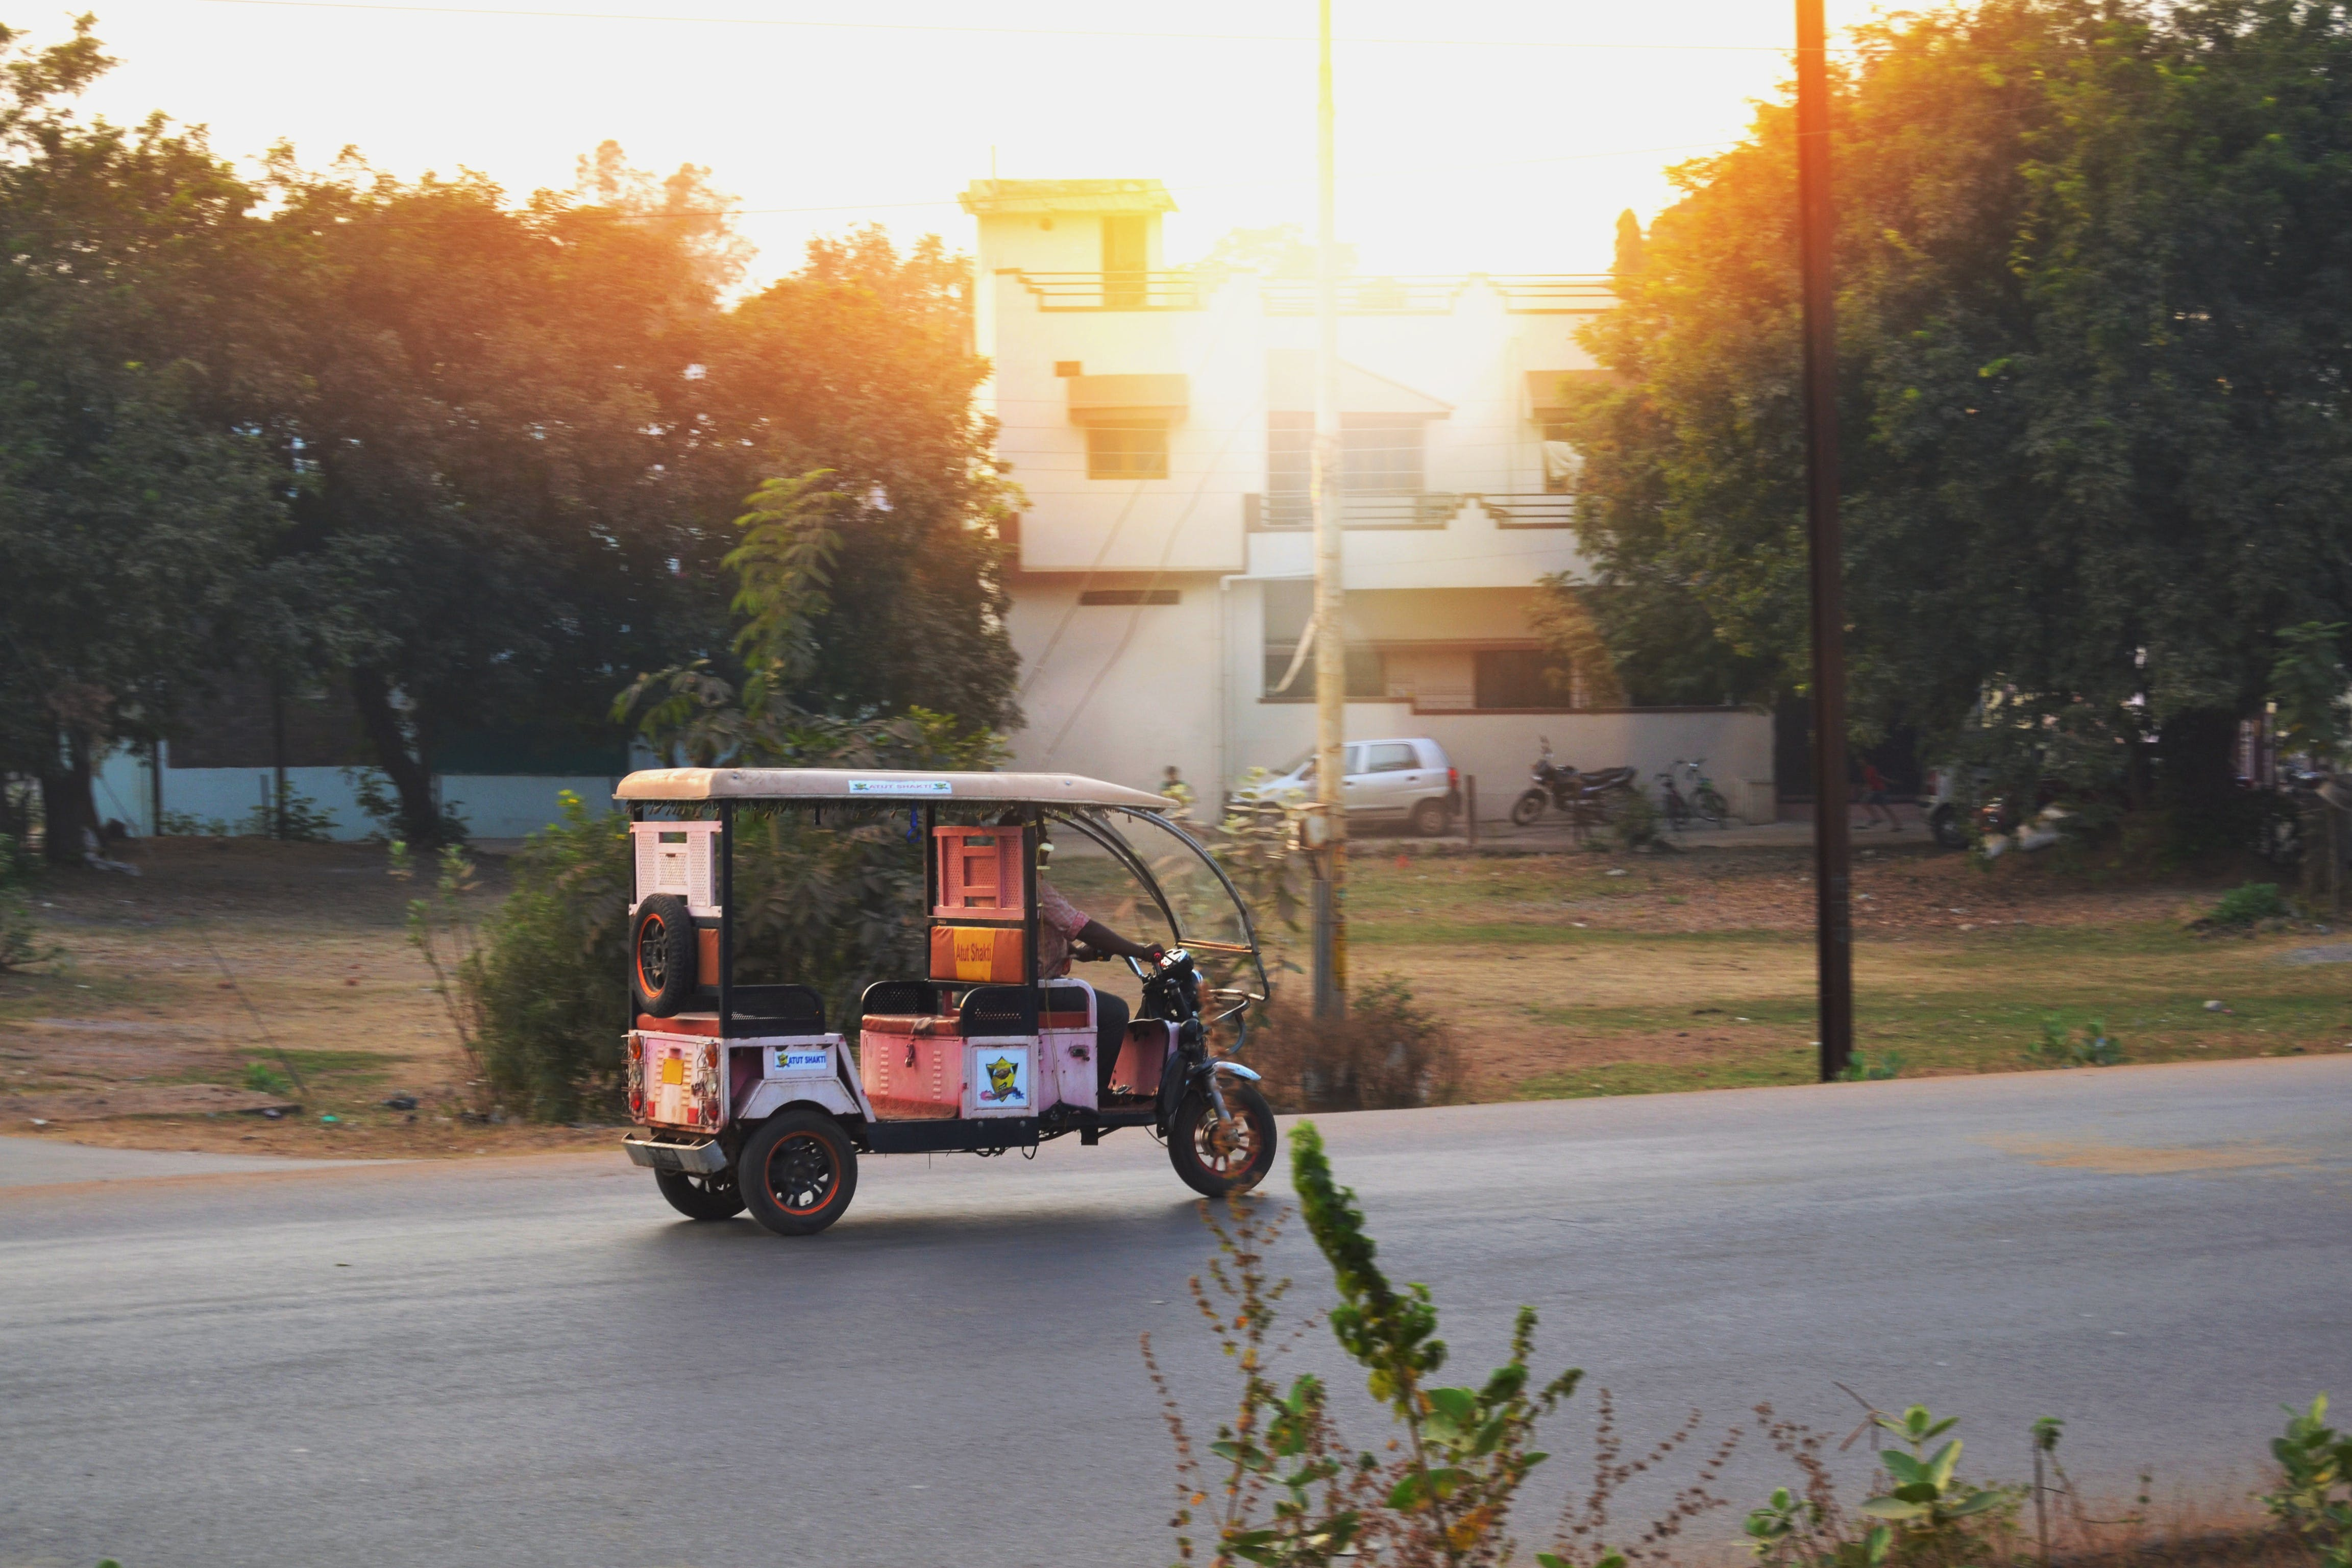 advertisement, atmospheric evening, auto rickshaw